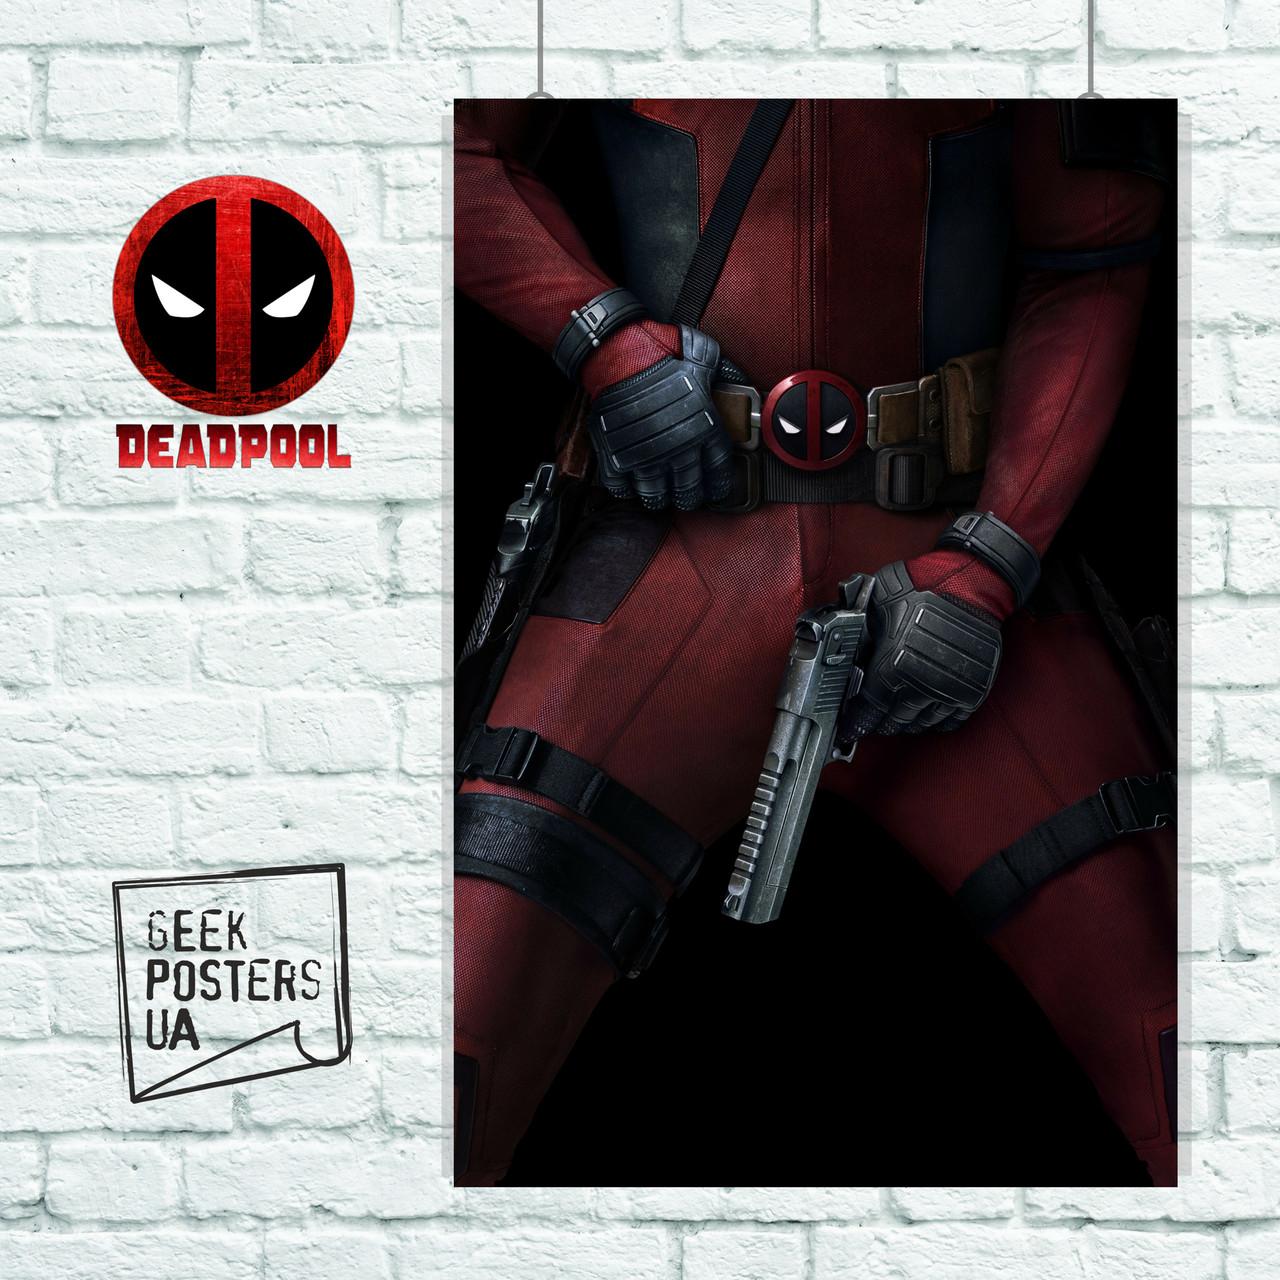 Постер Deadpool, Дэдпул, Дедпул с пистолетом в штанах. Размер 60x42см (A2). Глянцевая бумага